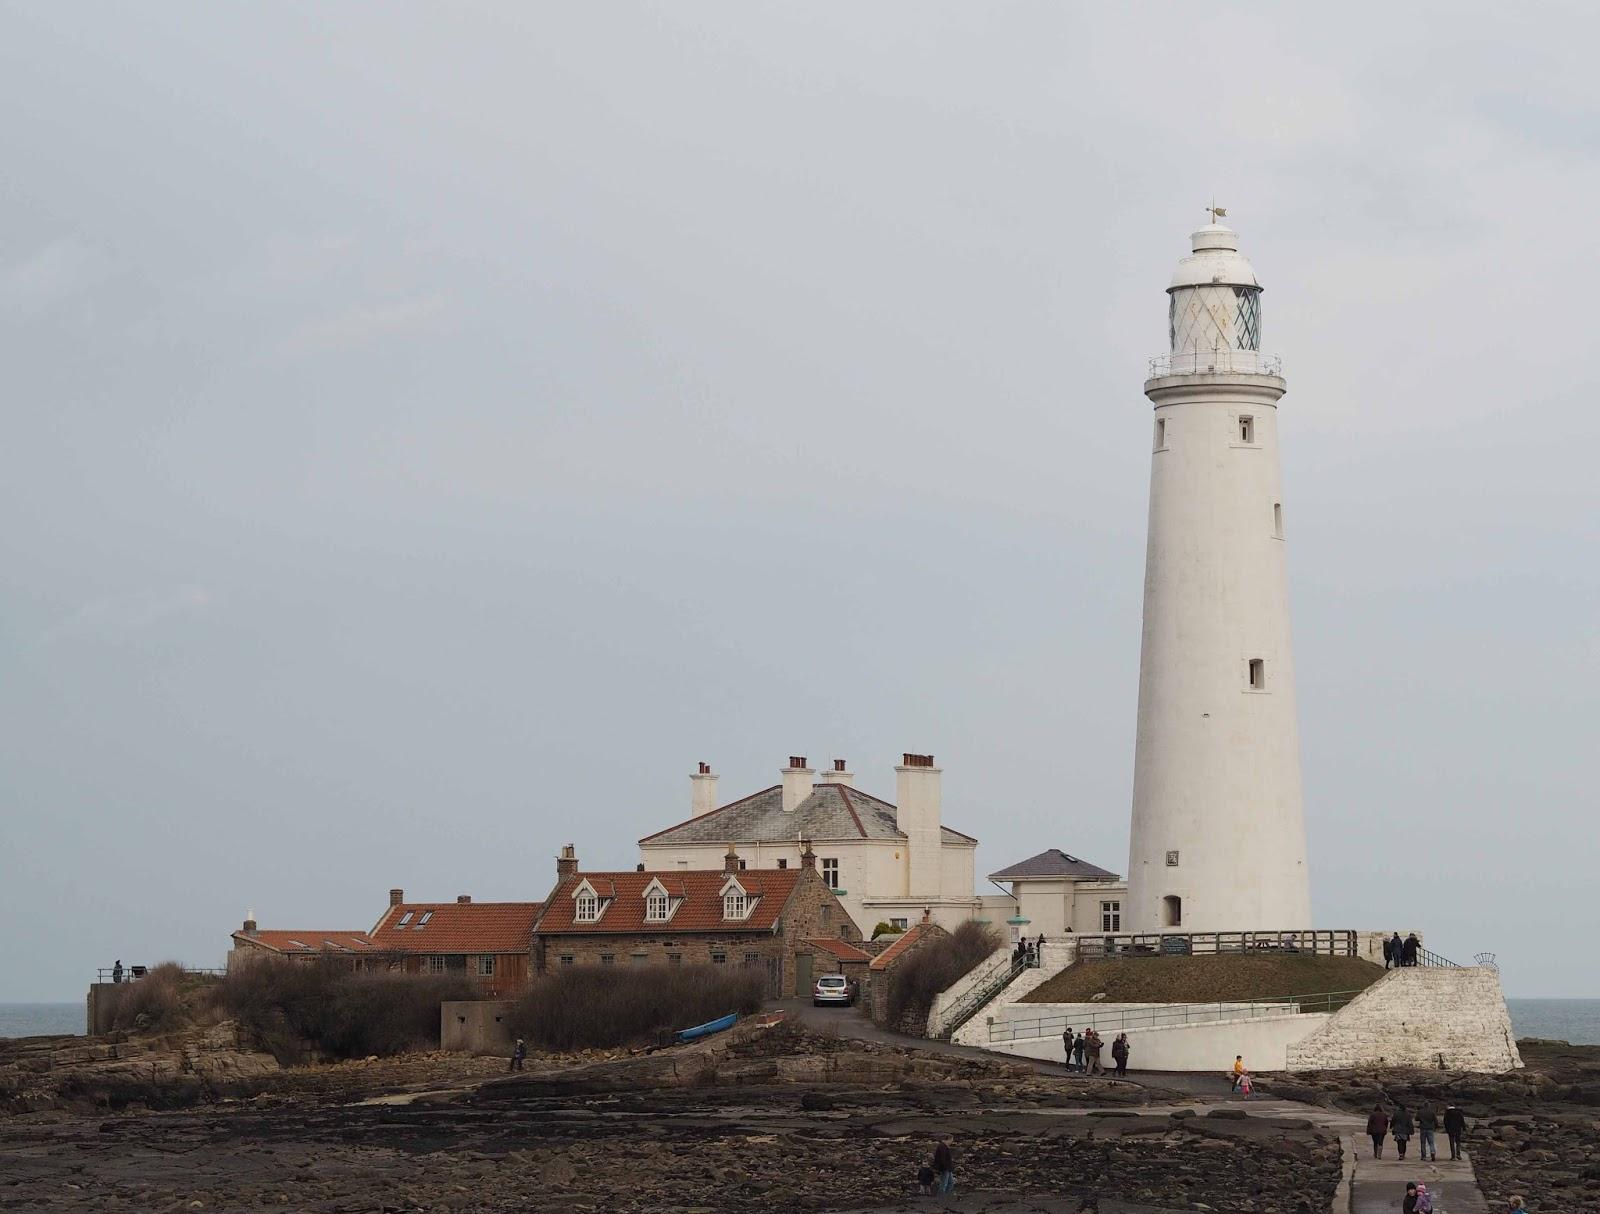 St Marys Lighthouse, Whitley Bay